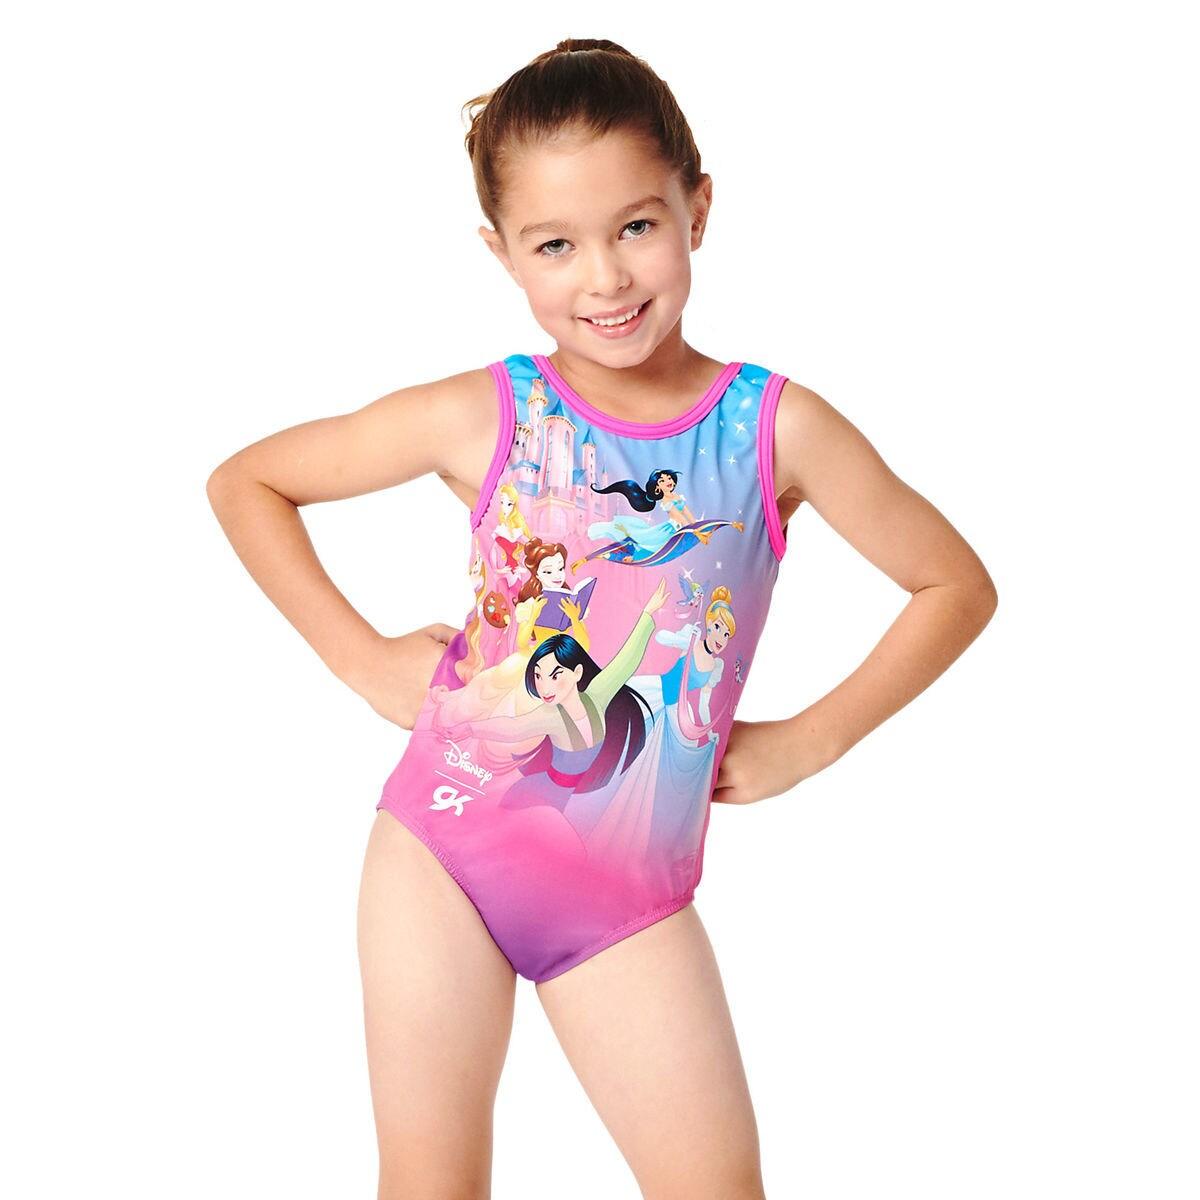 b7b9957fa Disney Princess Leotard - Girls